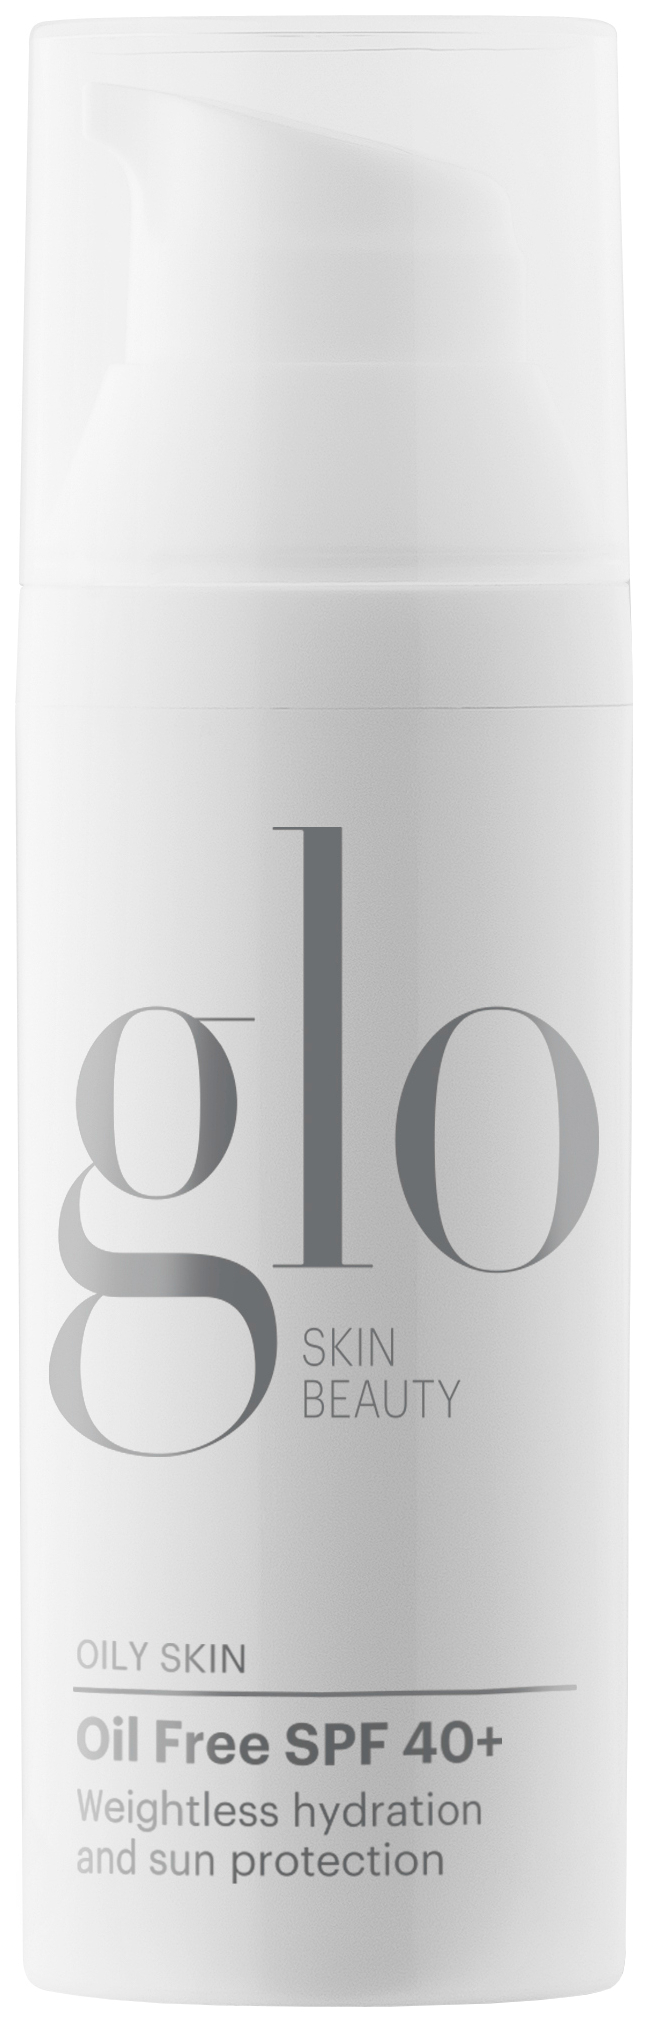 Солнцезащитный крем Glo Skin Beauty Oil Free